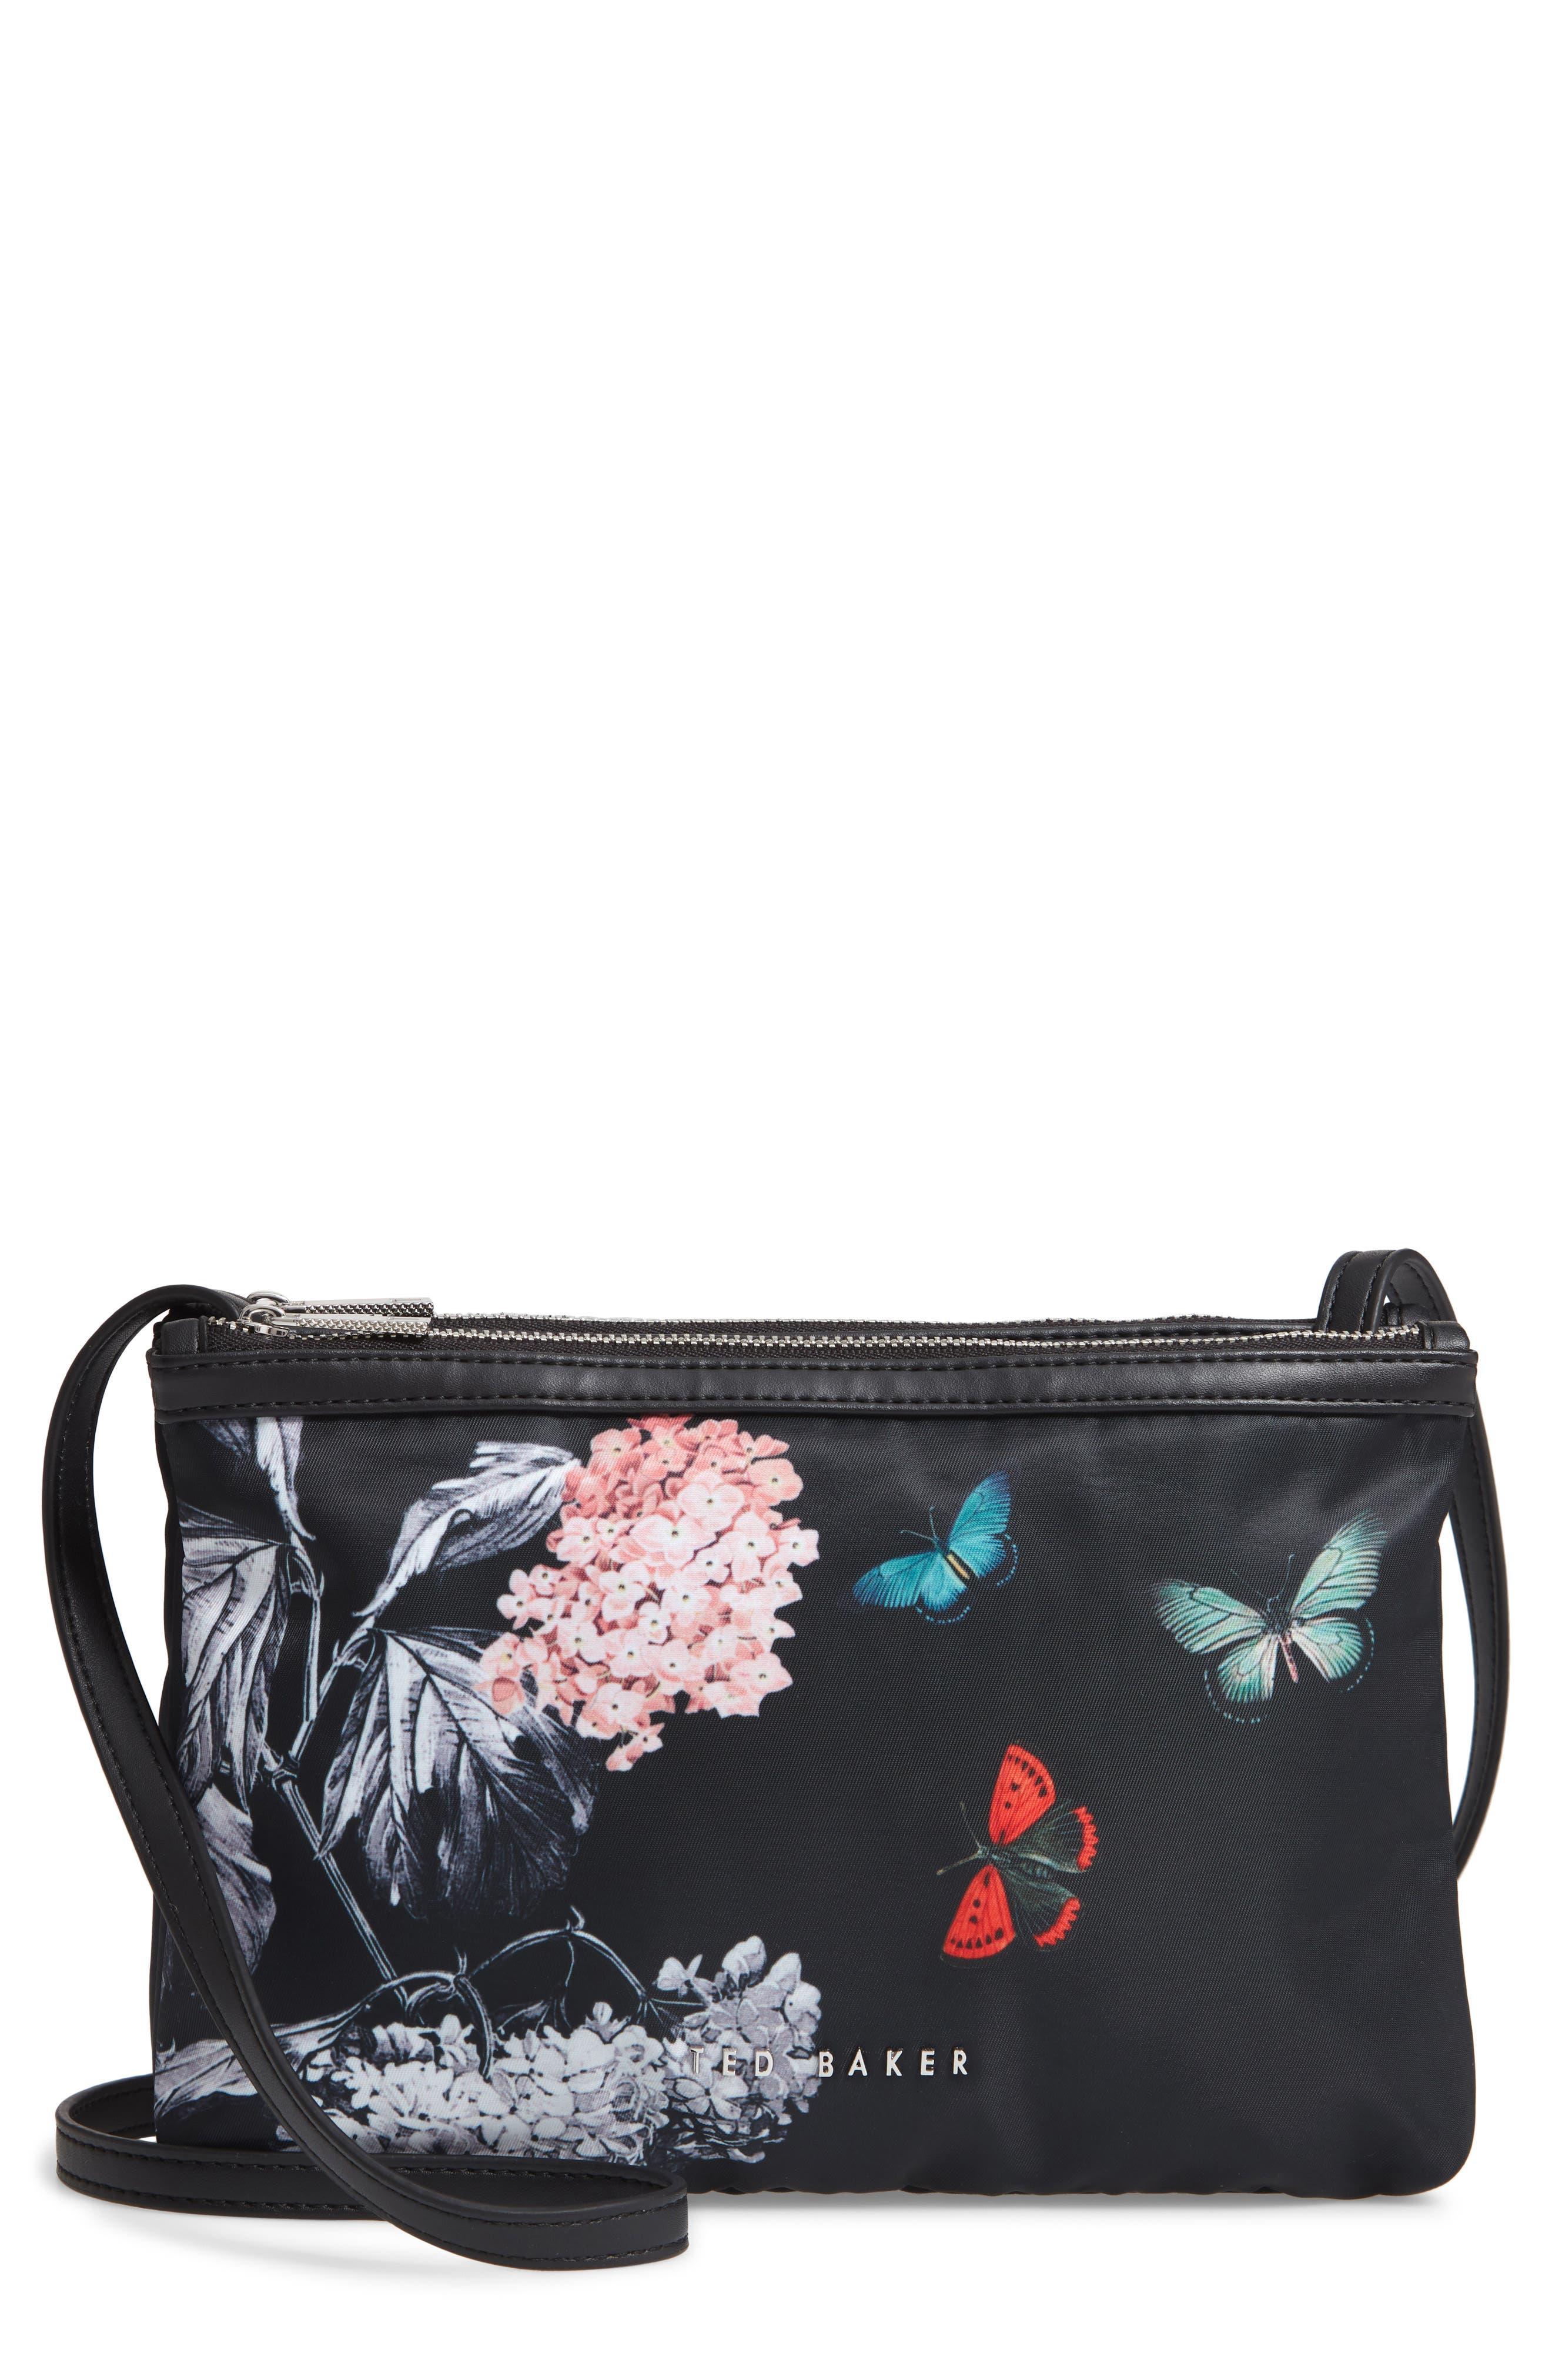 Myyaa Narrnia Nylon Crossbody Bag,                             Main thumbnail 1, color,                             BLACK